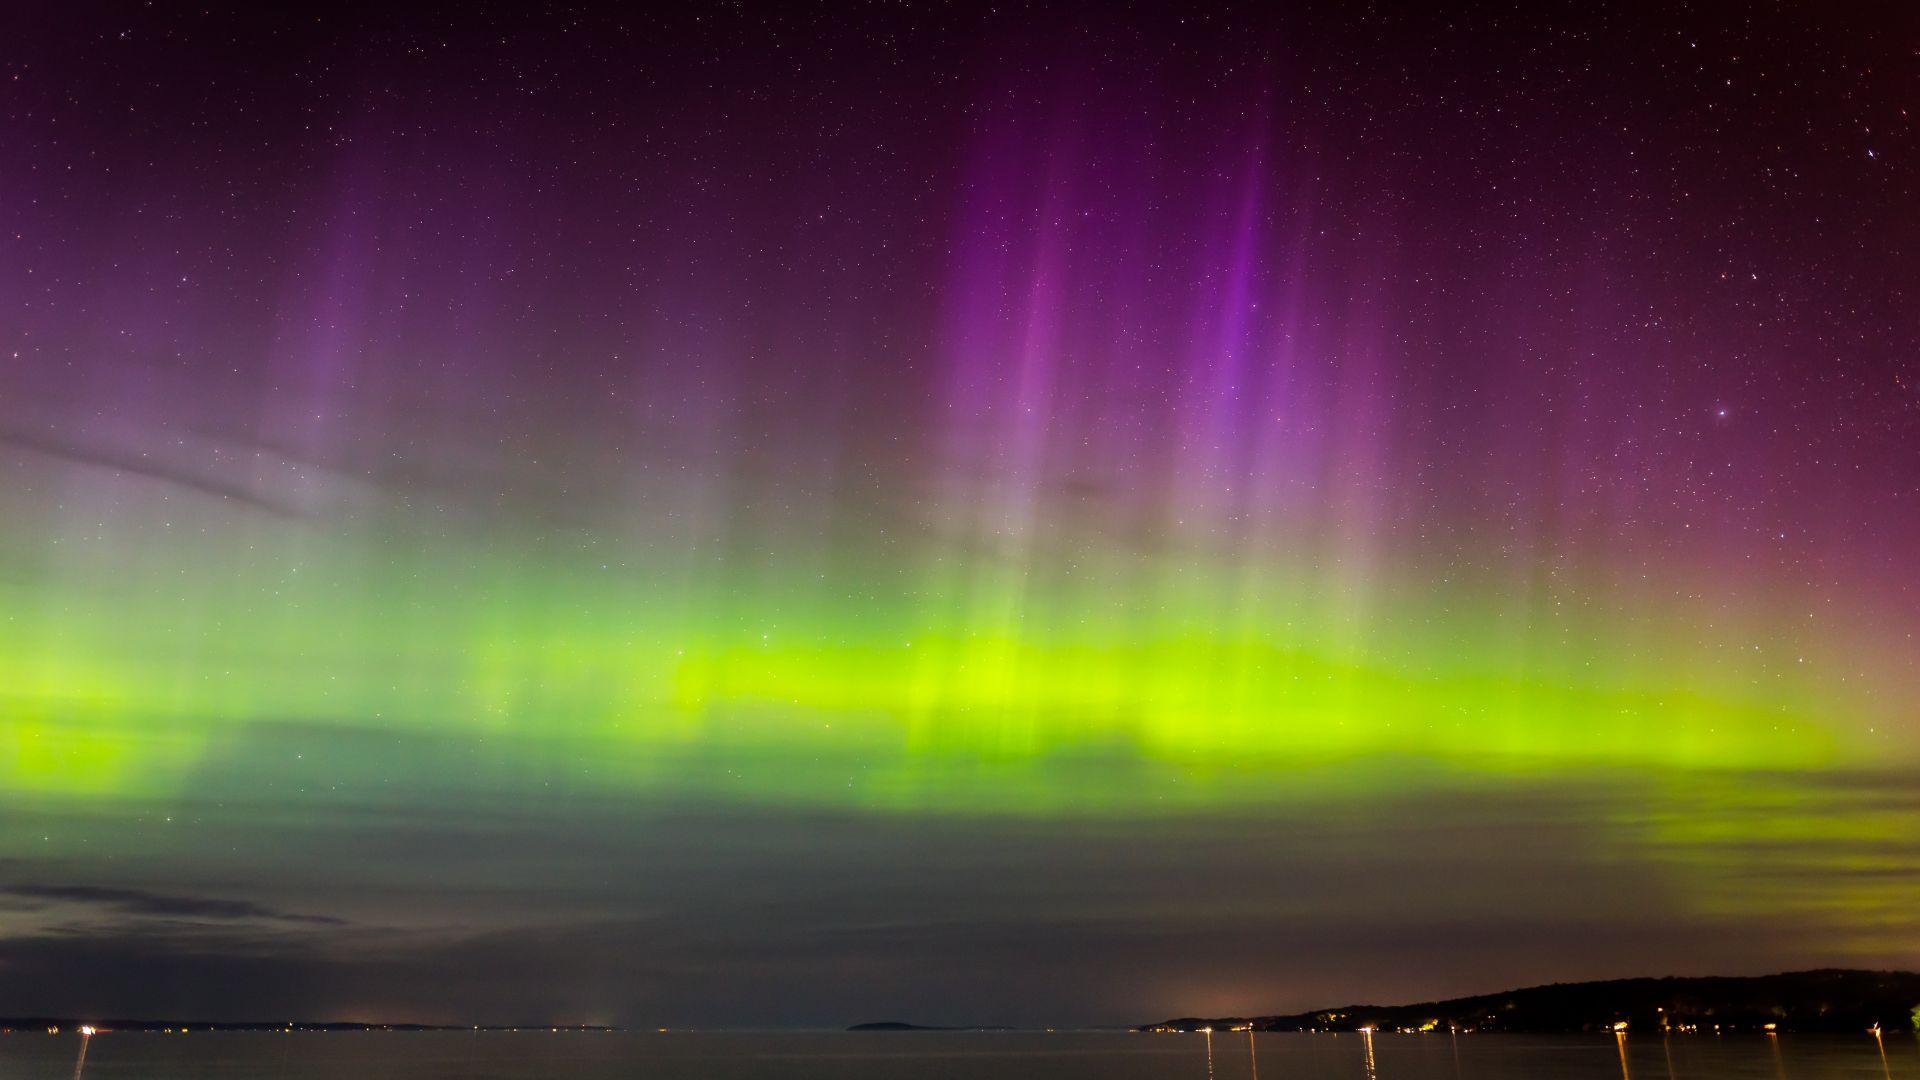 aurora northern lights borealis nature night